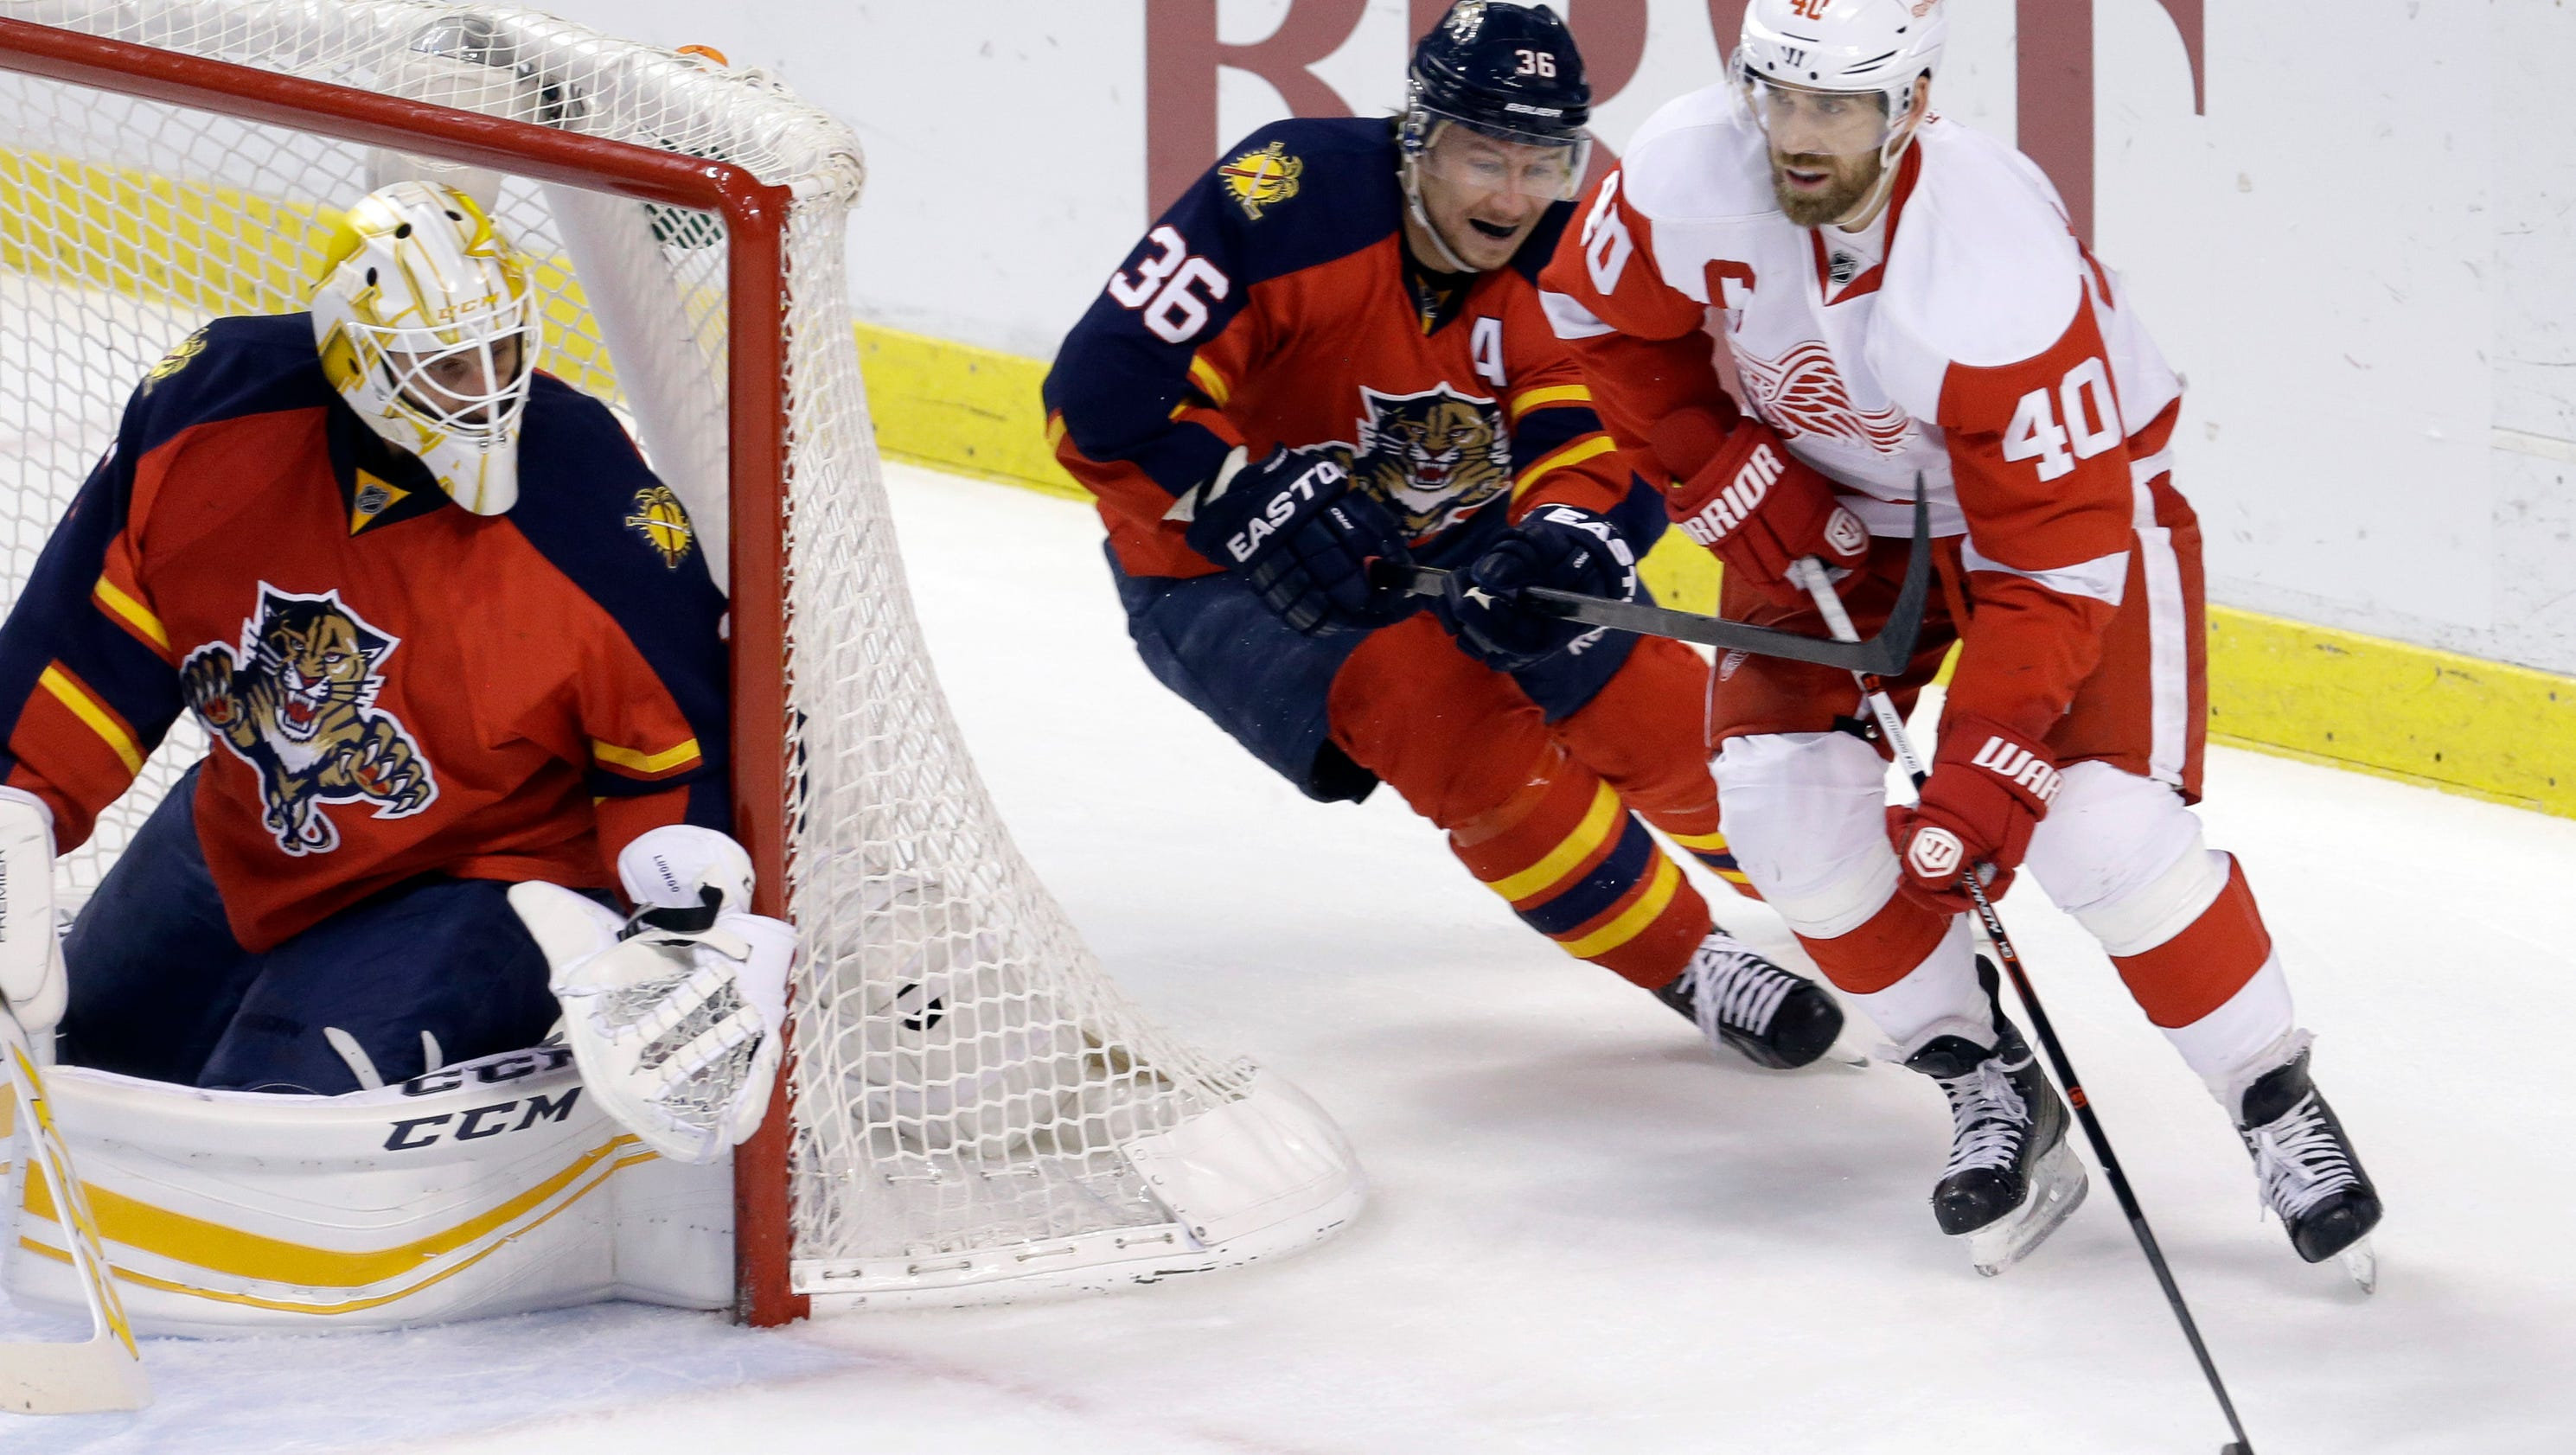 635902189752645816-ap-red-wings-panthers-hockey-2-